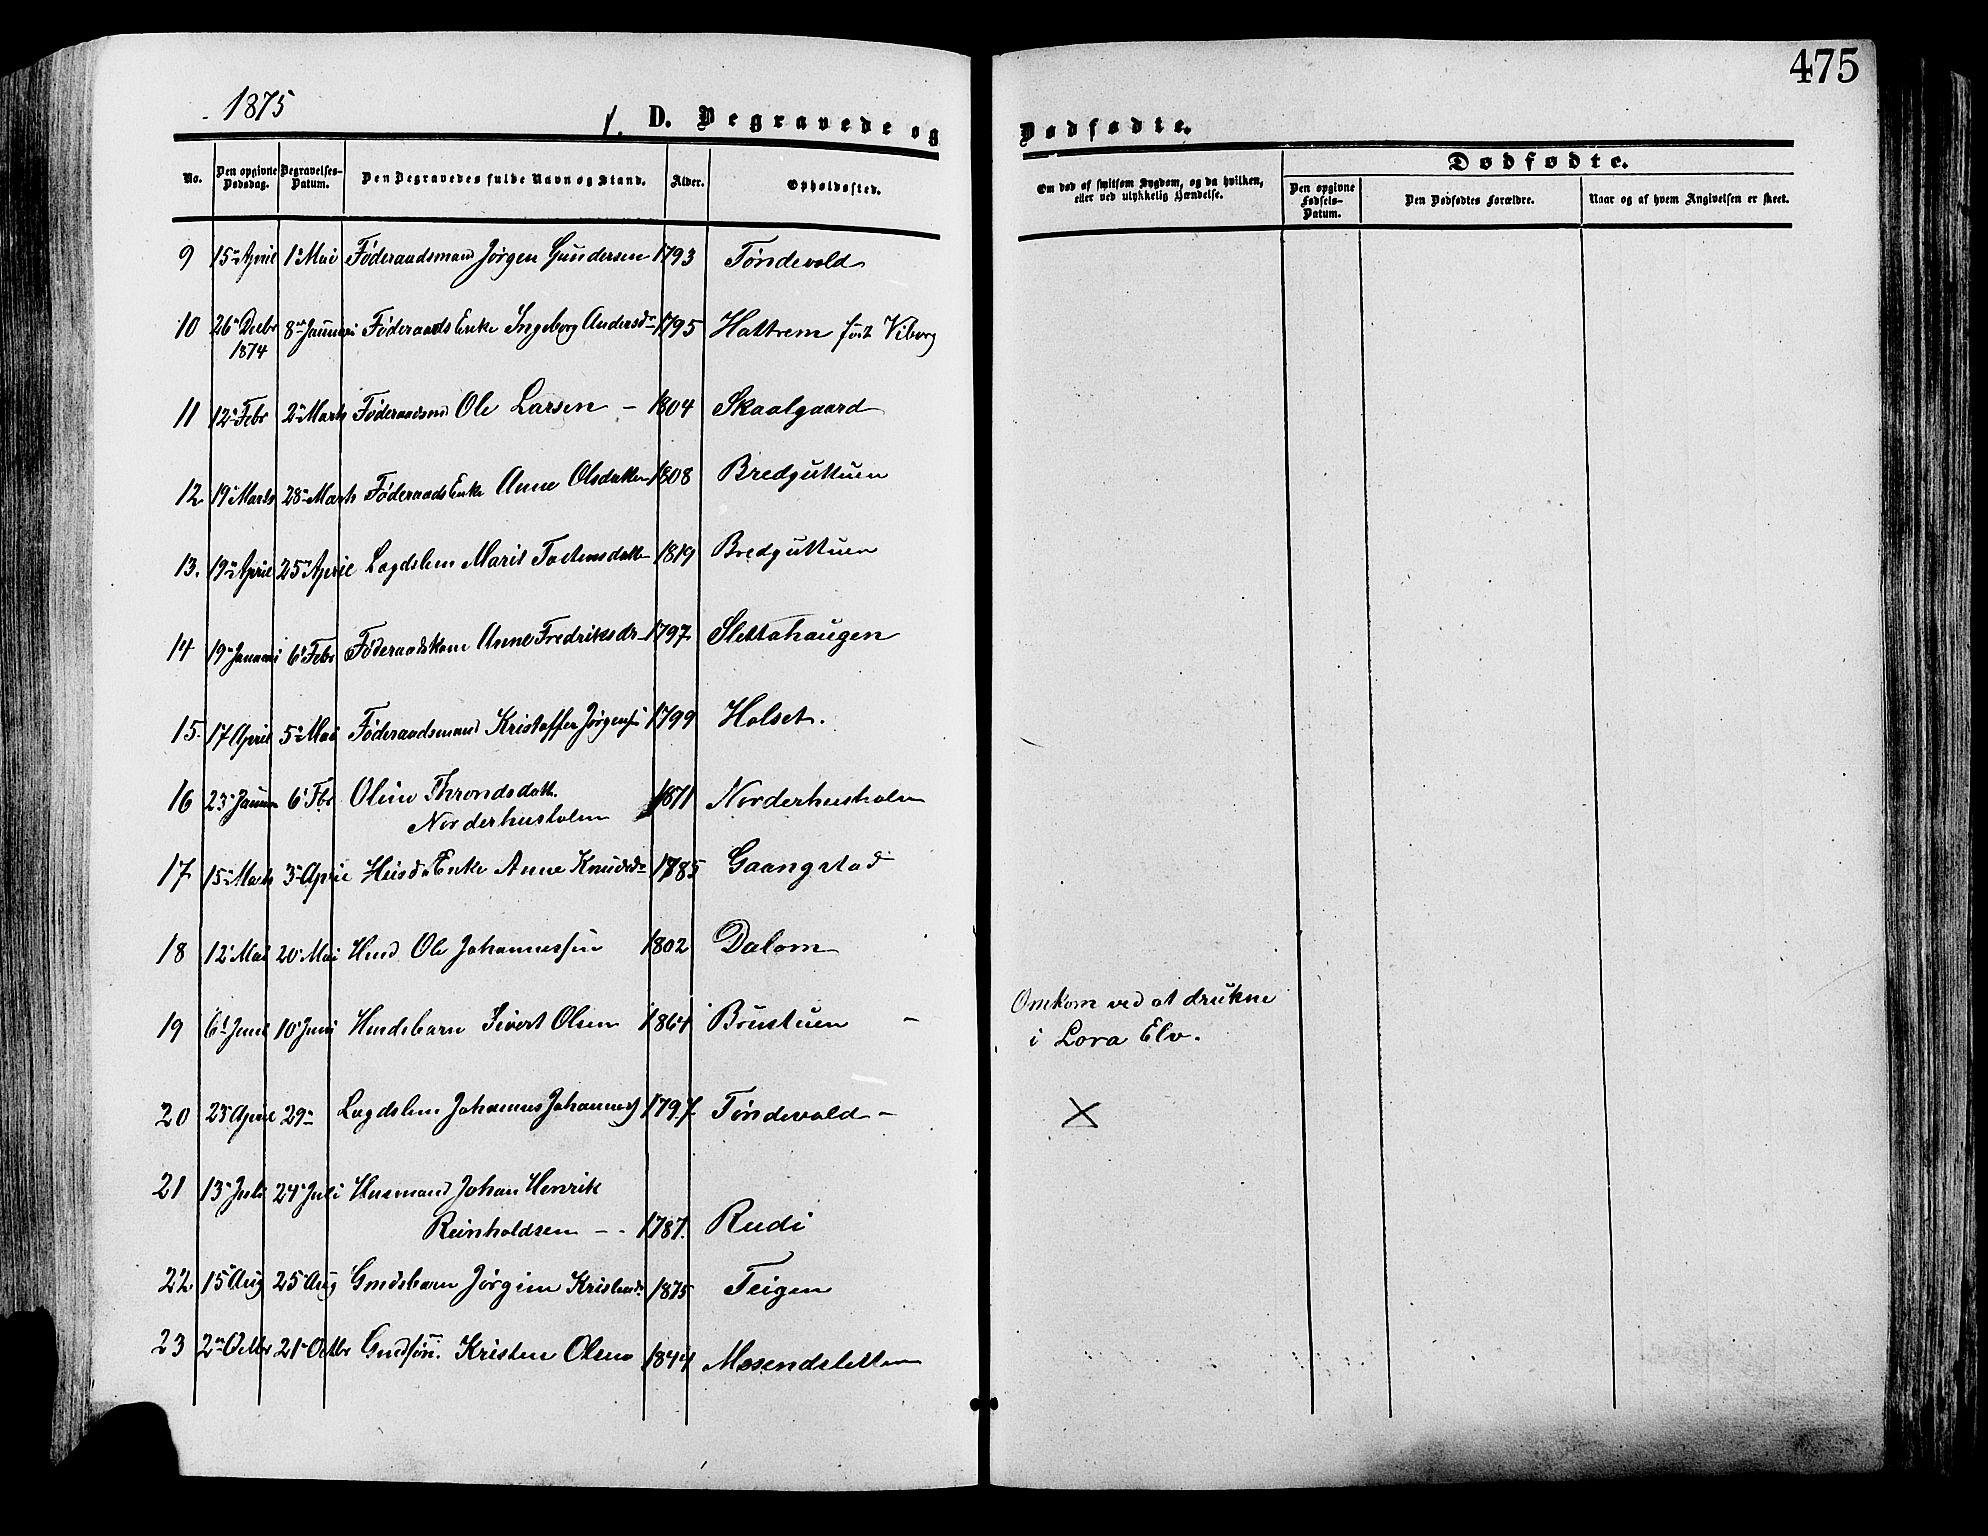 SAH, Lesja prestekontor, Ministerialbok nr. 8, 1854-1880, s. 475